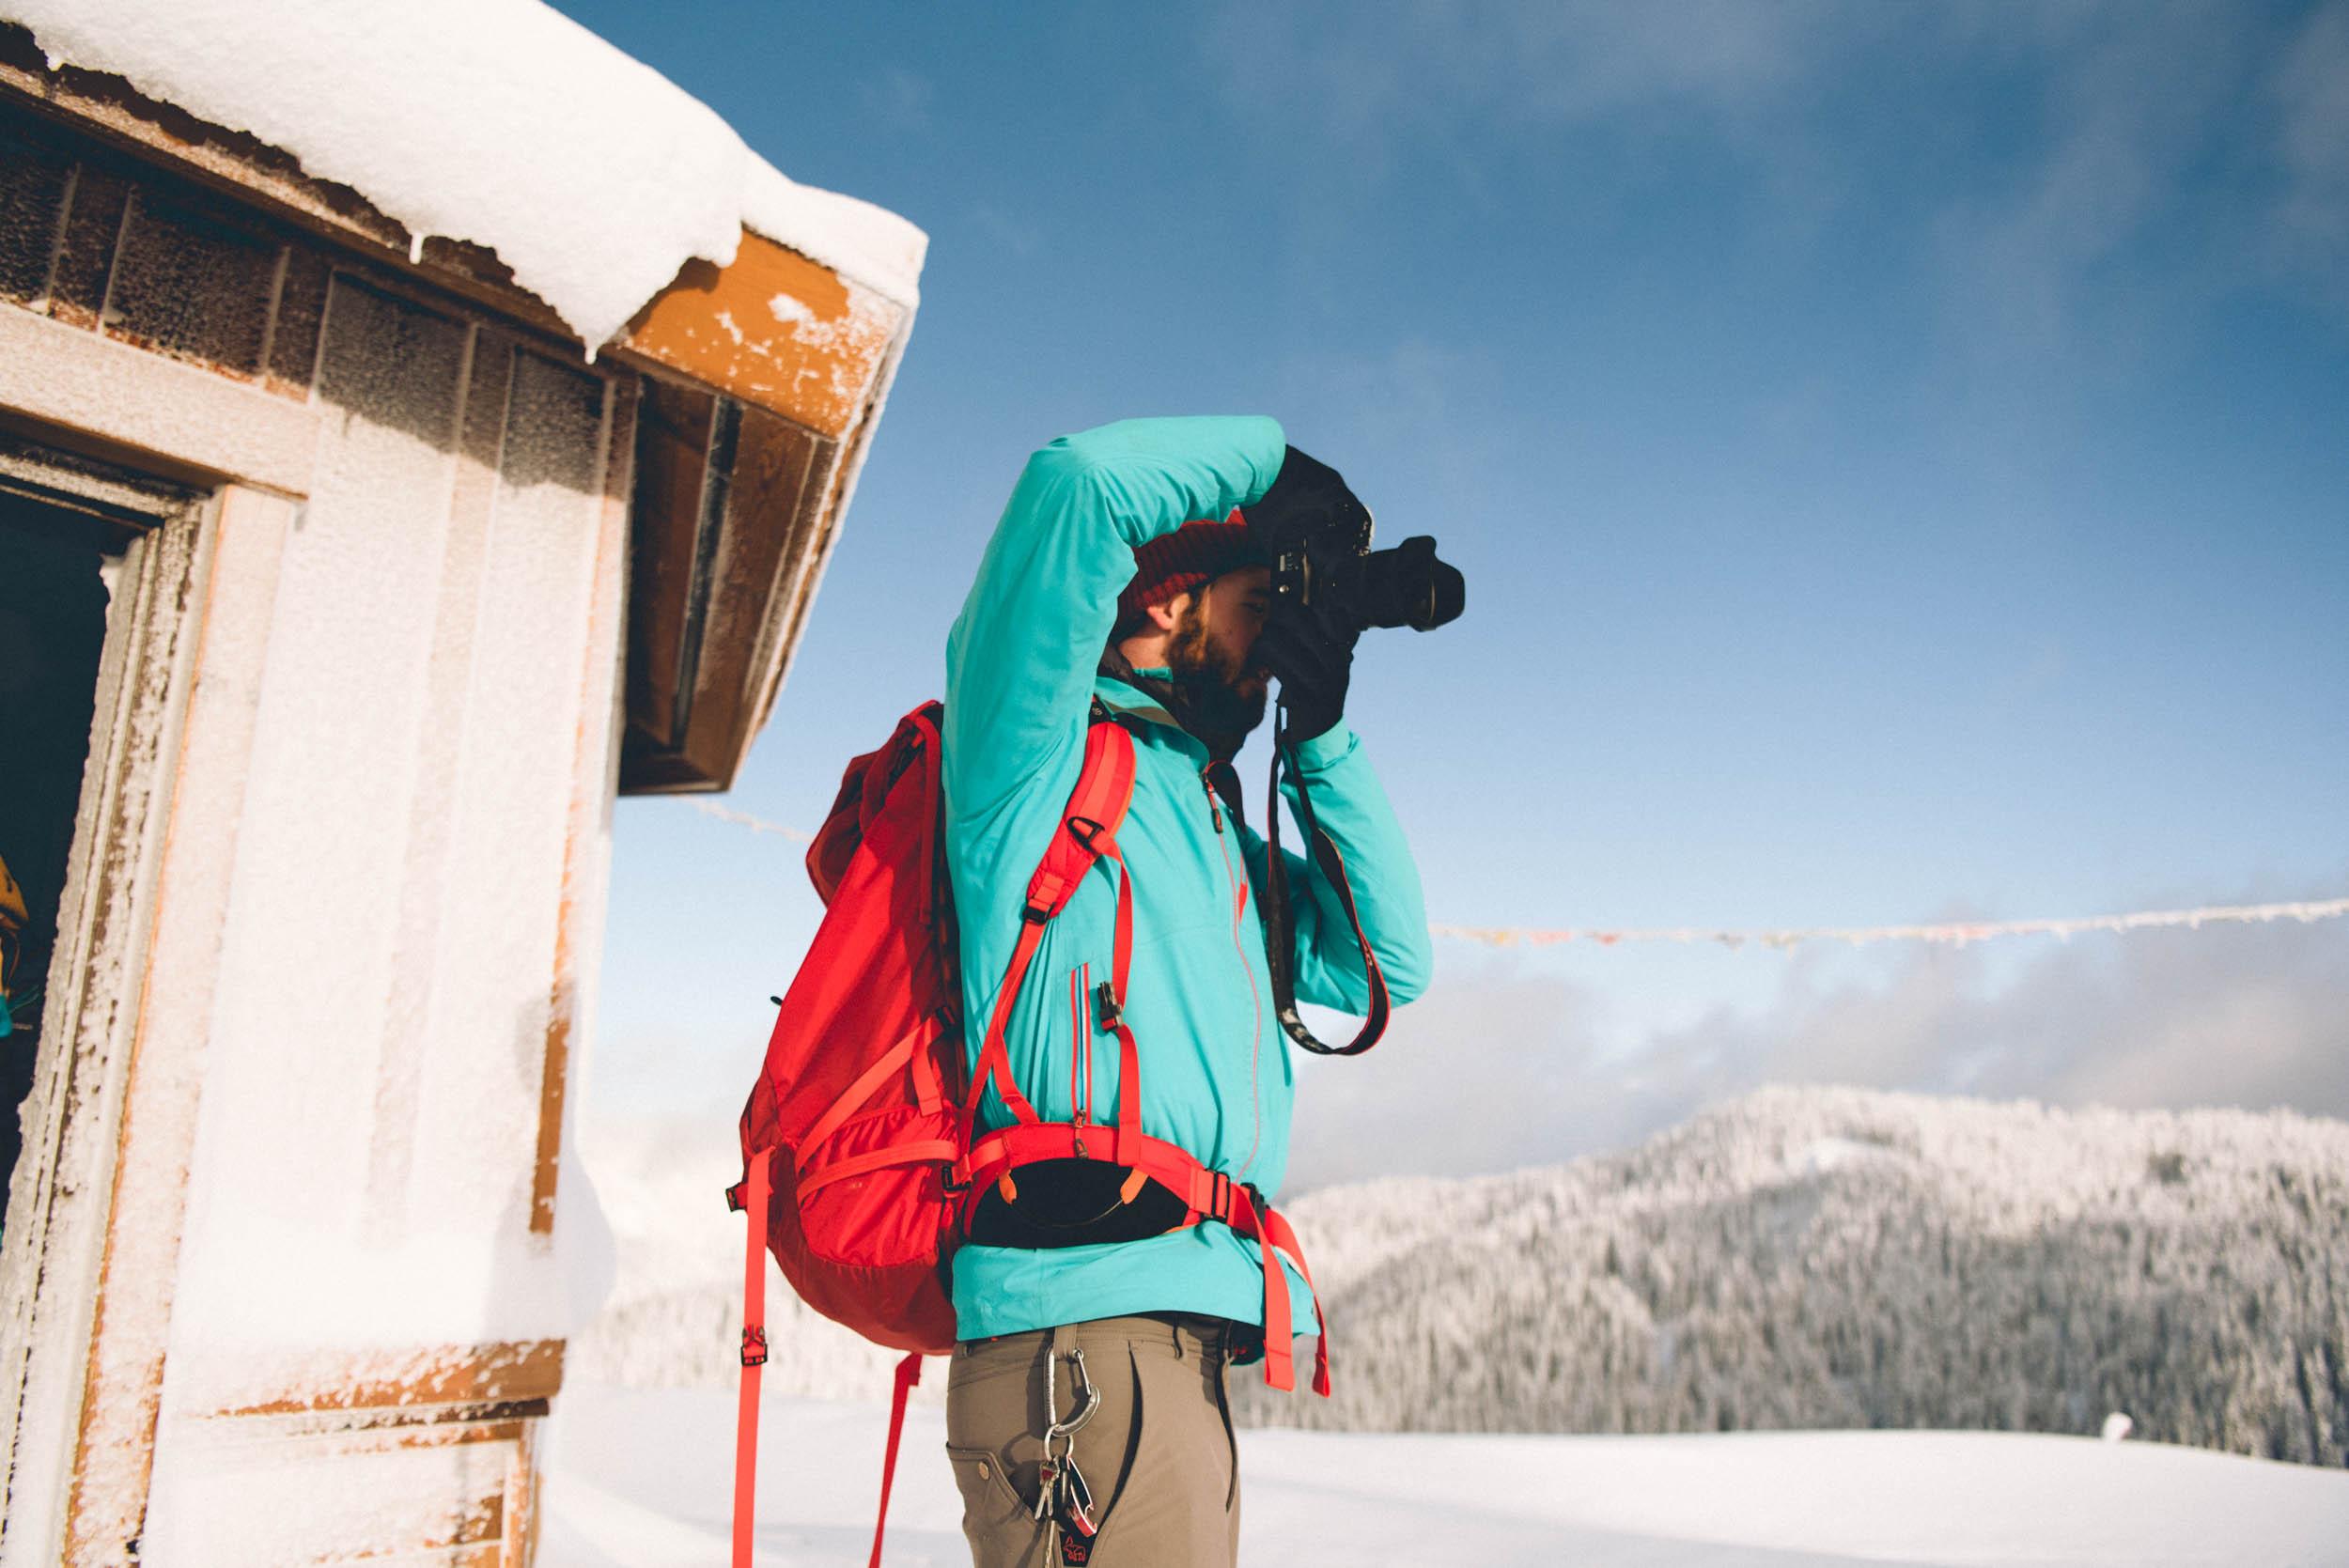 Miriam-Subbiah-Snow-Bowl-Hut-18.jpg